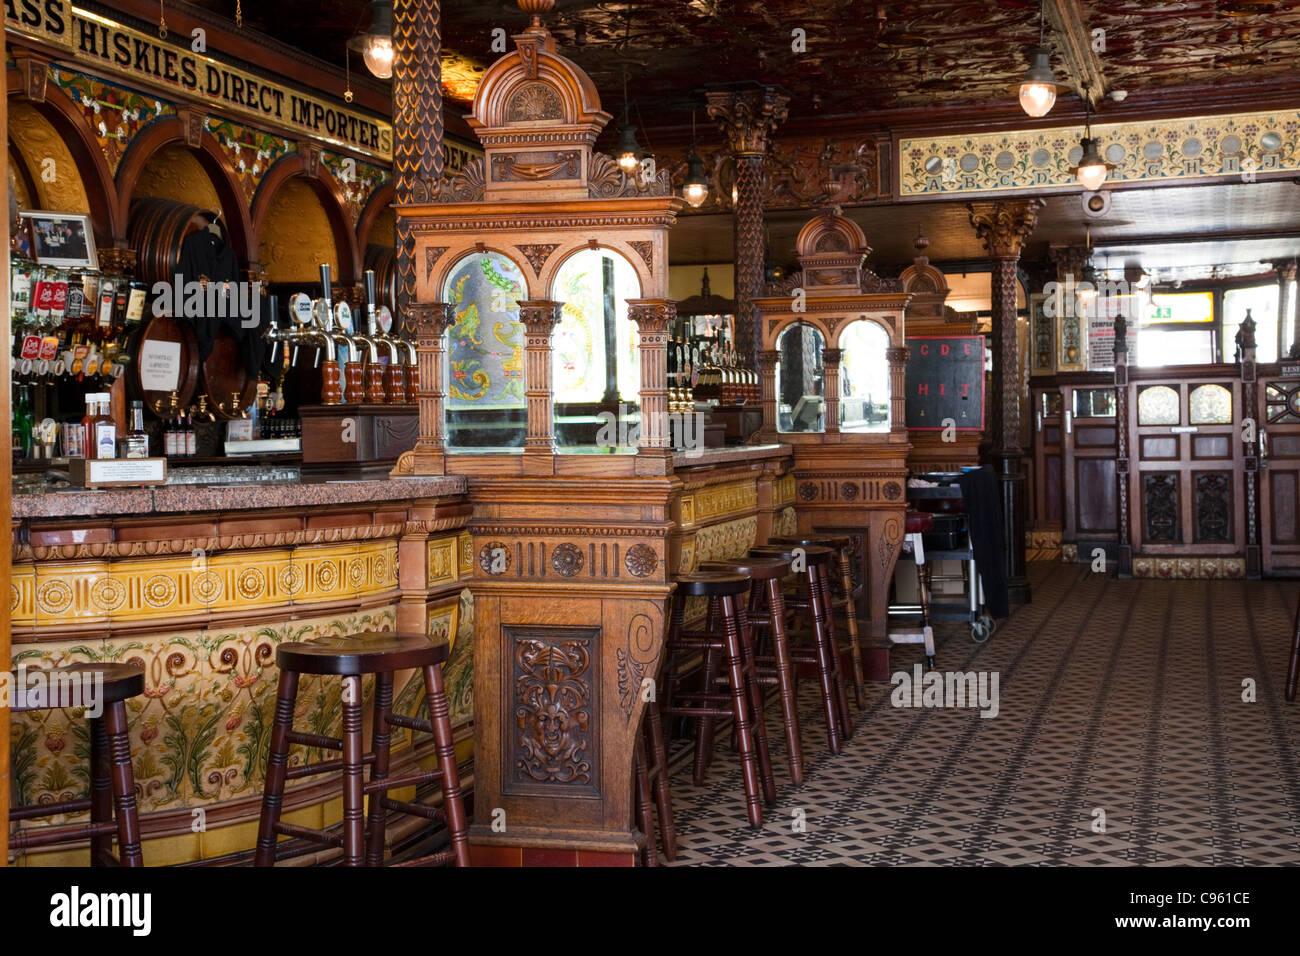 Northern Ireland, Belfast, Interior of the Crown Liquor Saloon - Stock Image